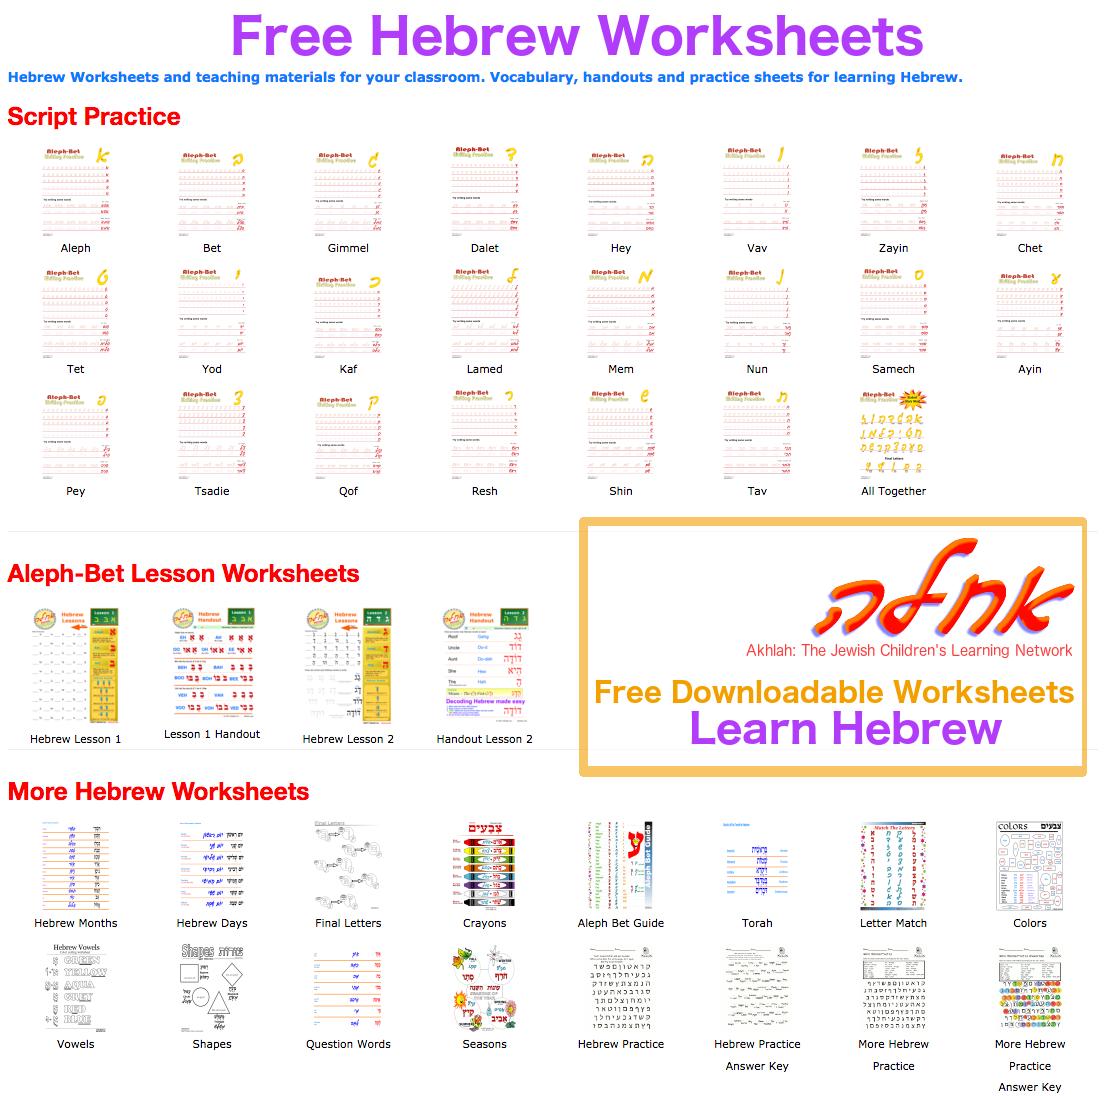 Predownload: Akhlah Com Free Hebrew Worksheets And Handouts Learn Hebrew Hebrew Writing Read Hebrew [ 1096 x 1113 Pixel ]